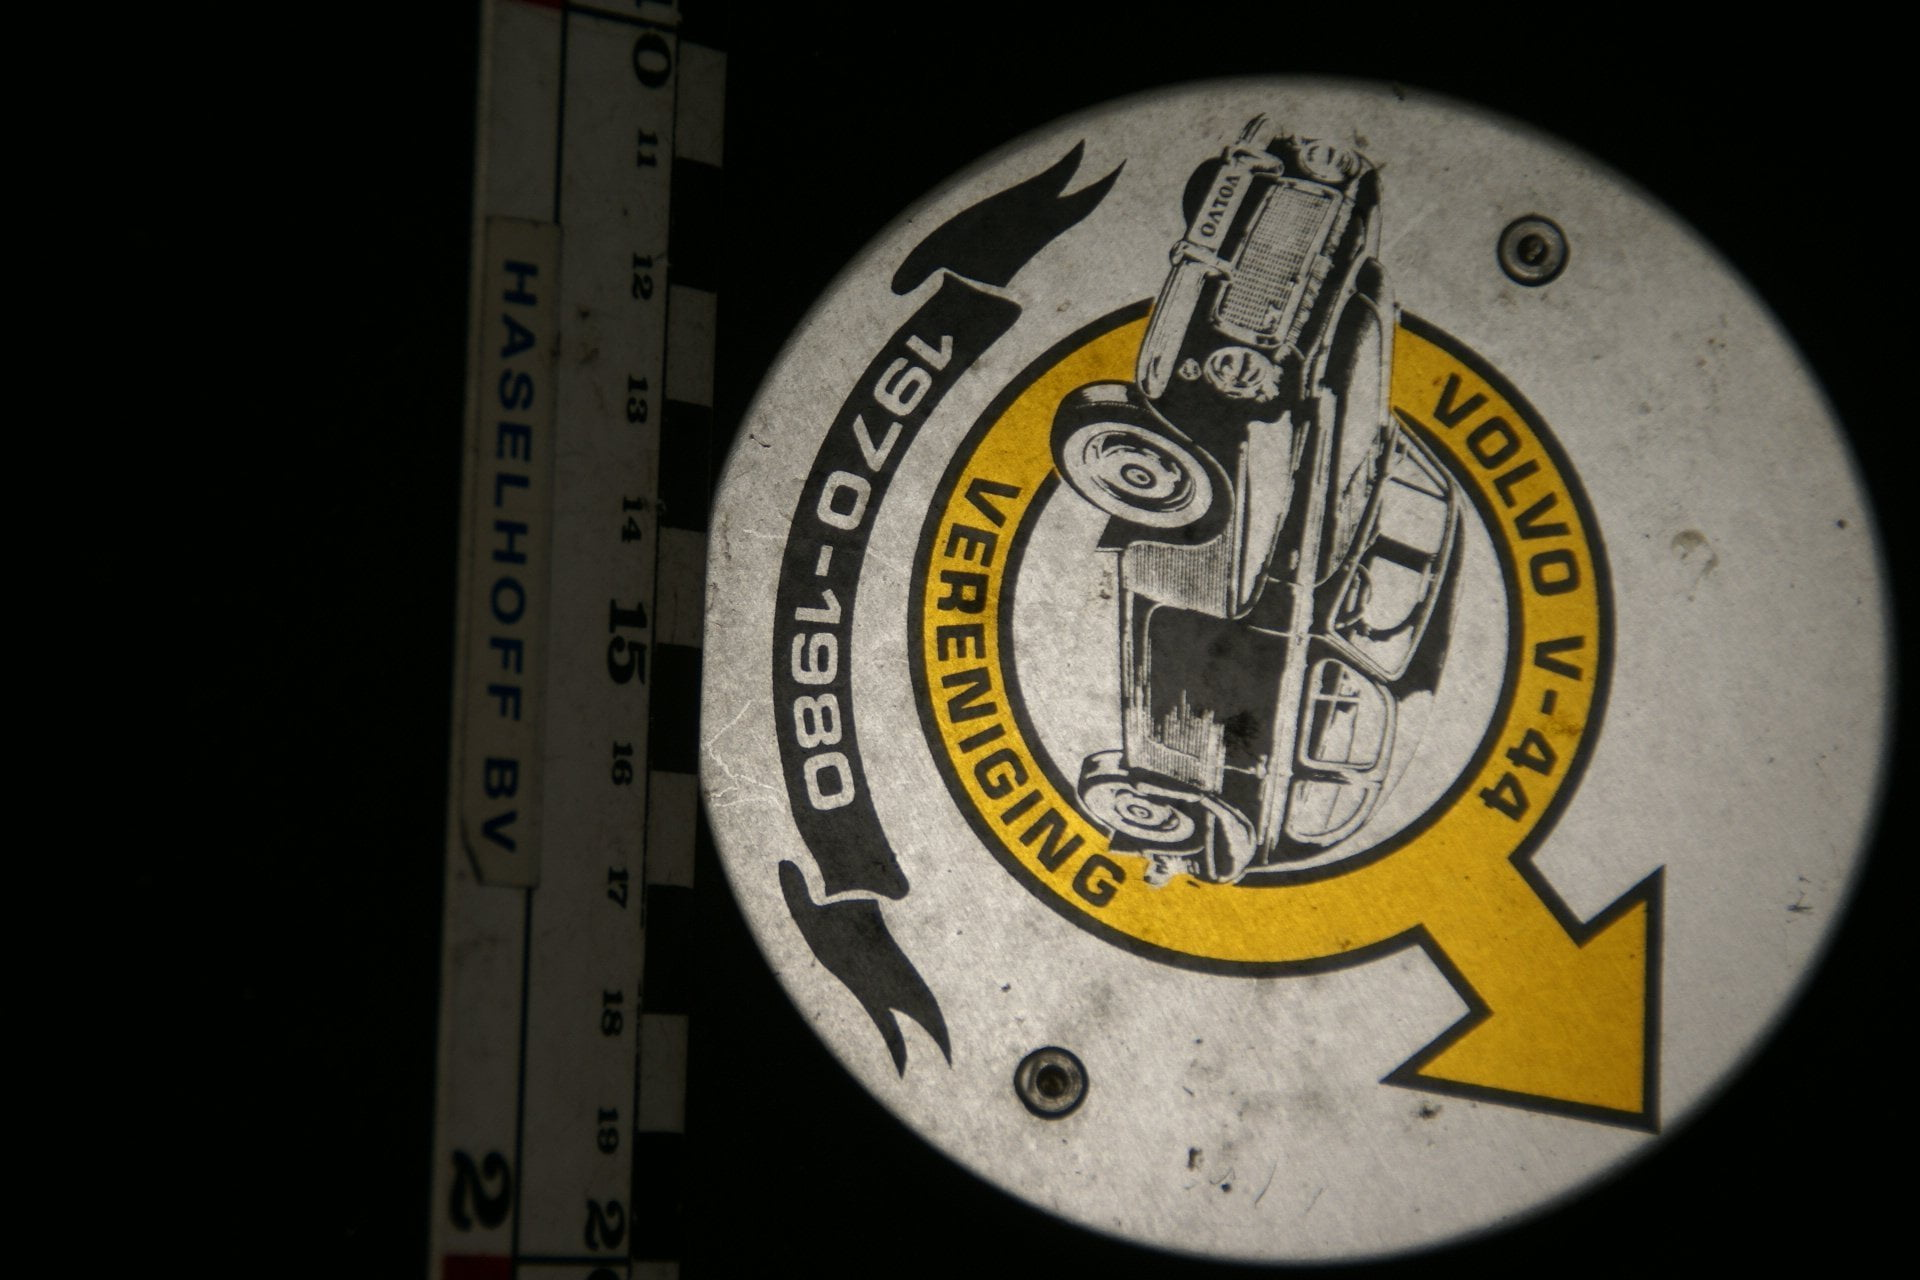 DSC08566 Volvo V44 vereniging 1970-1980 grille badge